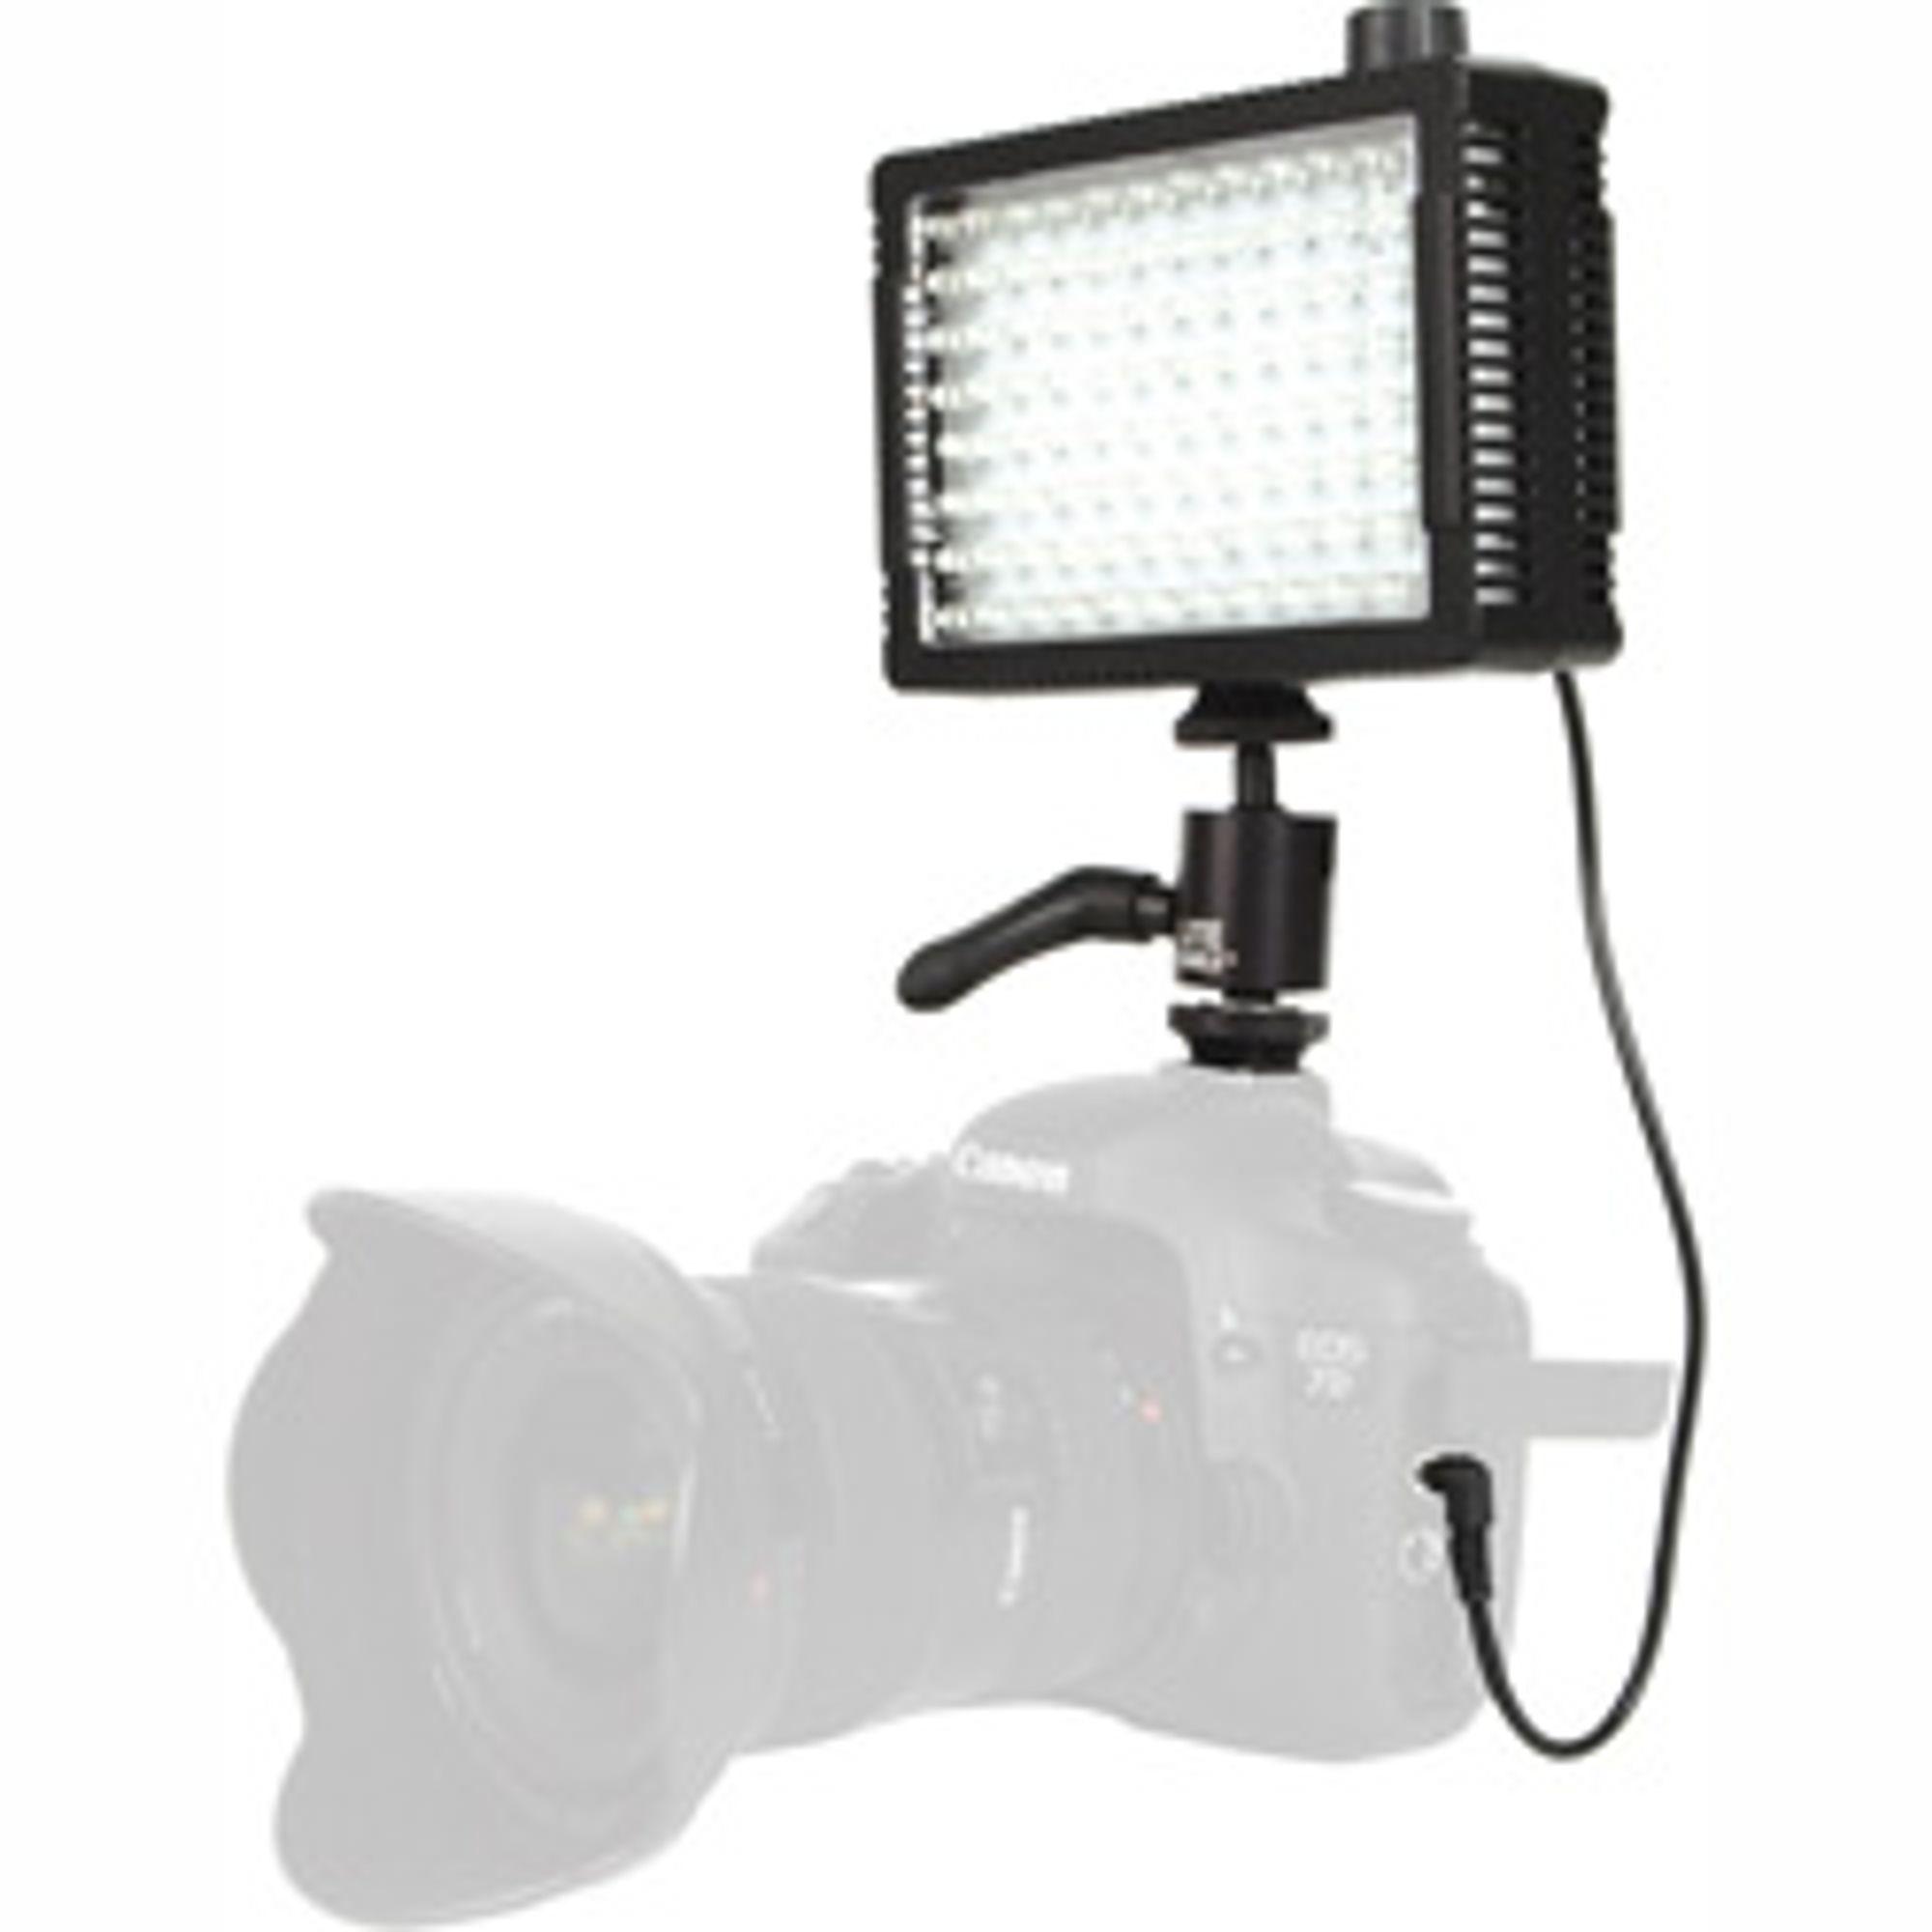 Litepanels Micropro Hybrid kan monteres både på kamera og stativ.